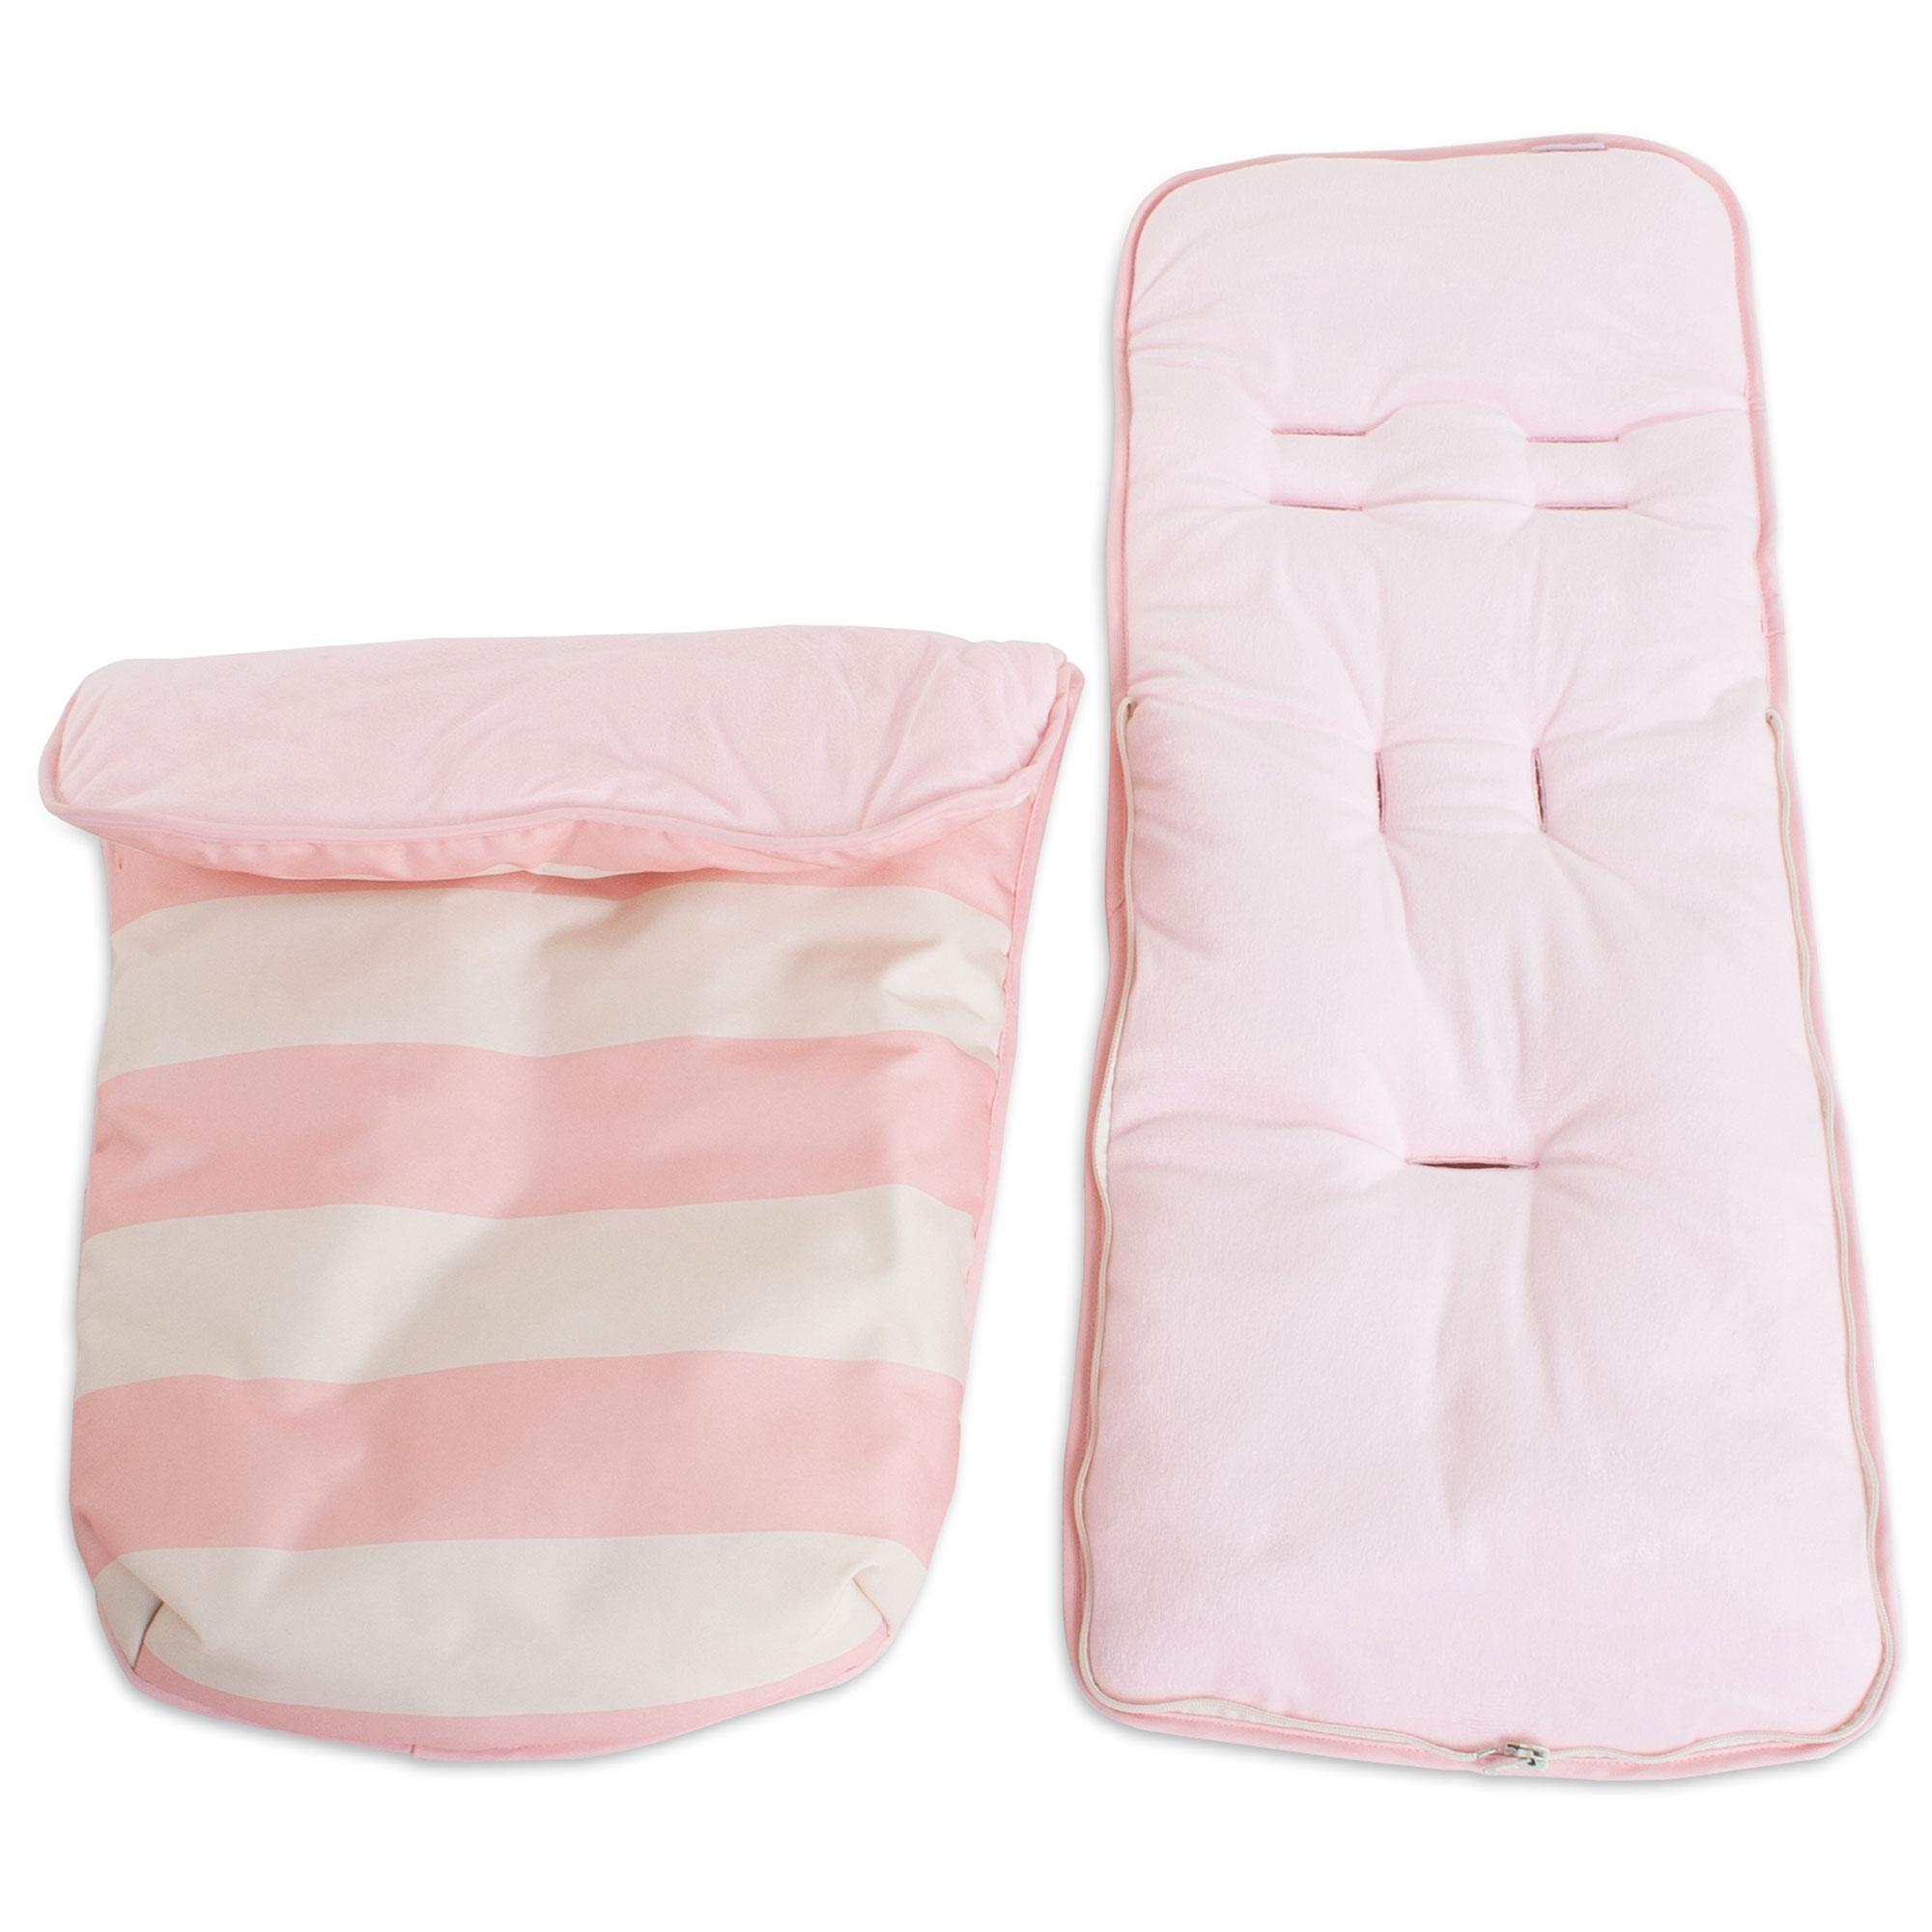 Pushchair Footmuff My Babiie Cosytoes Baby Pram Stroller Pink Stripes